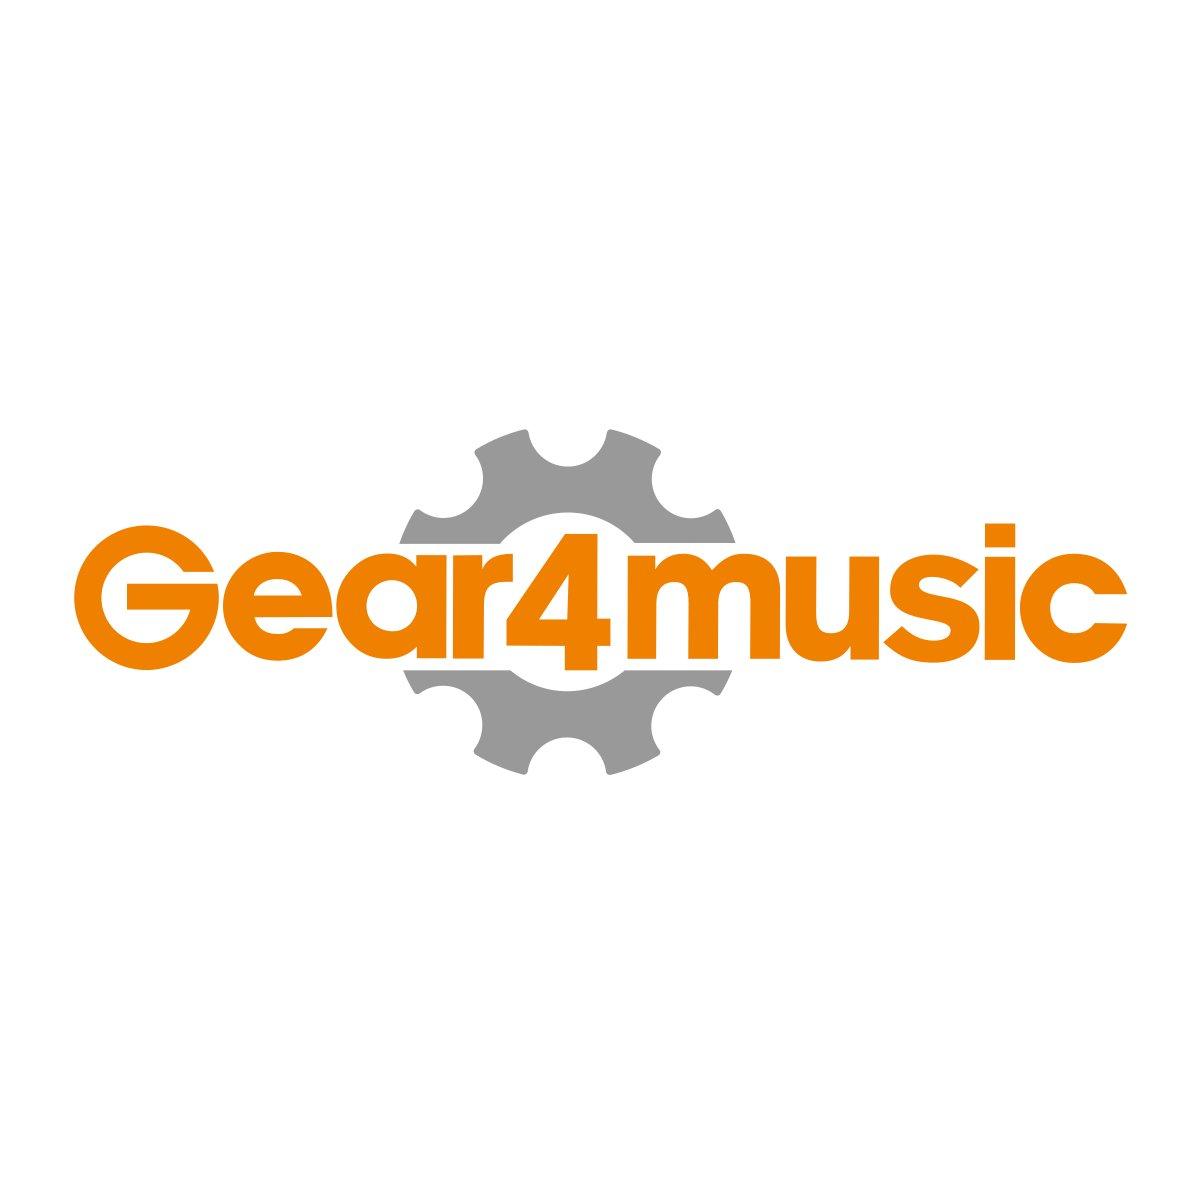 BDK-1 Drum Kit by Gear4music, Black